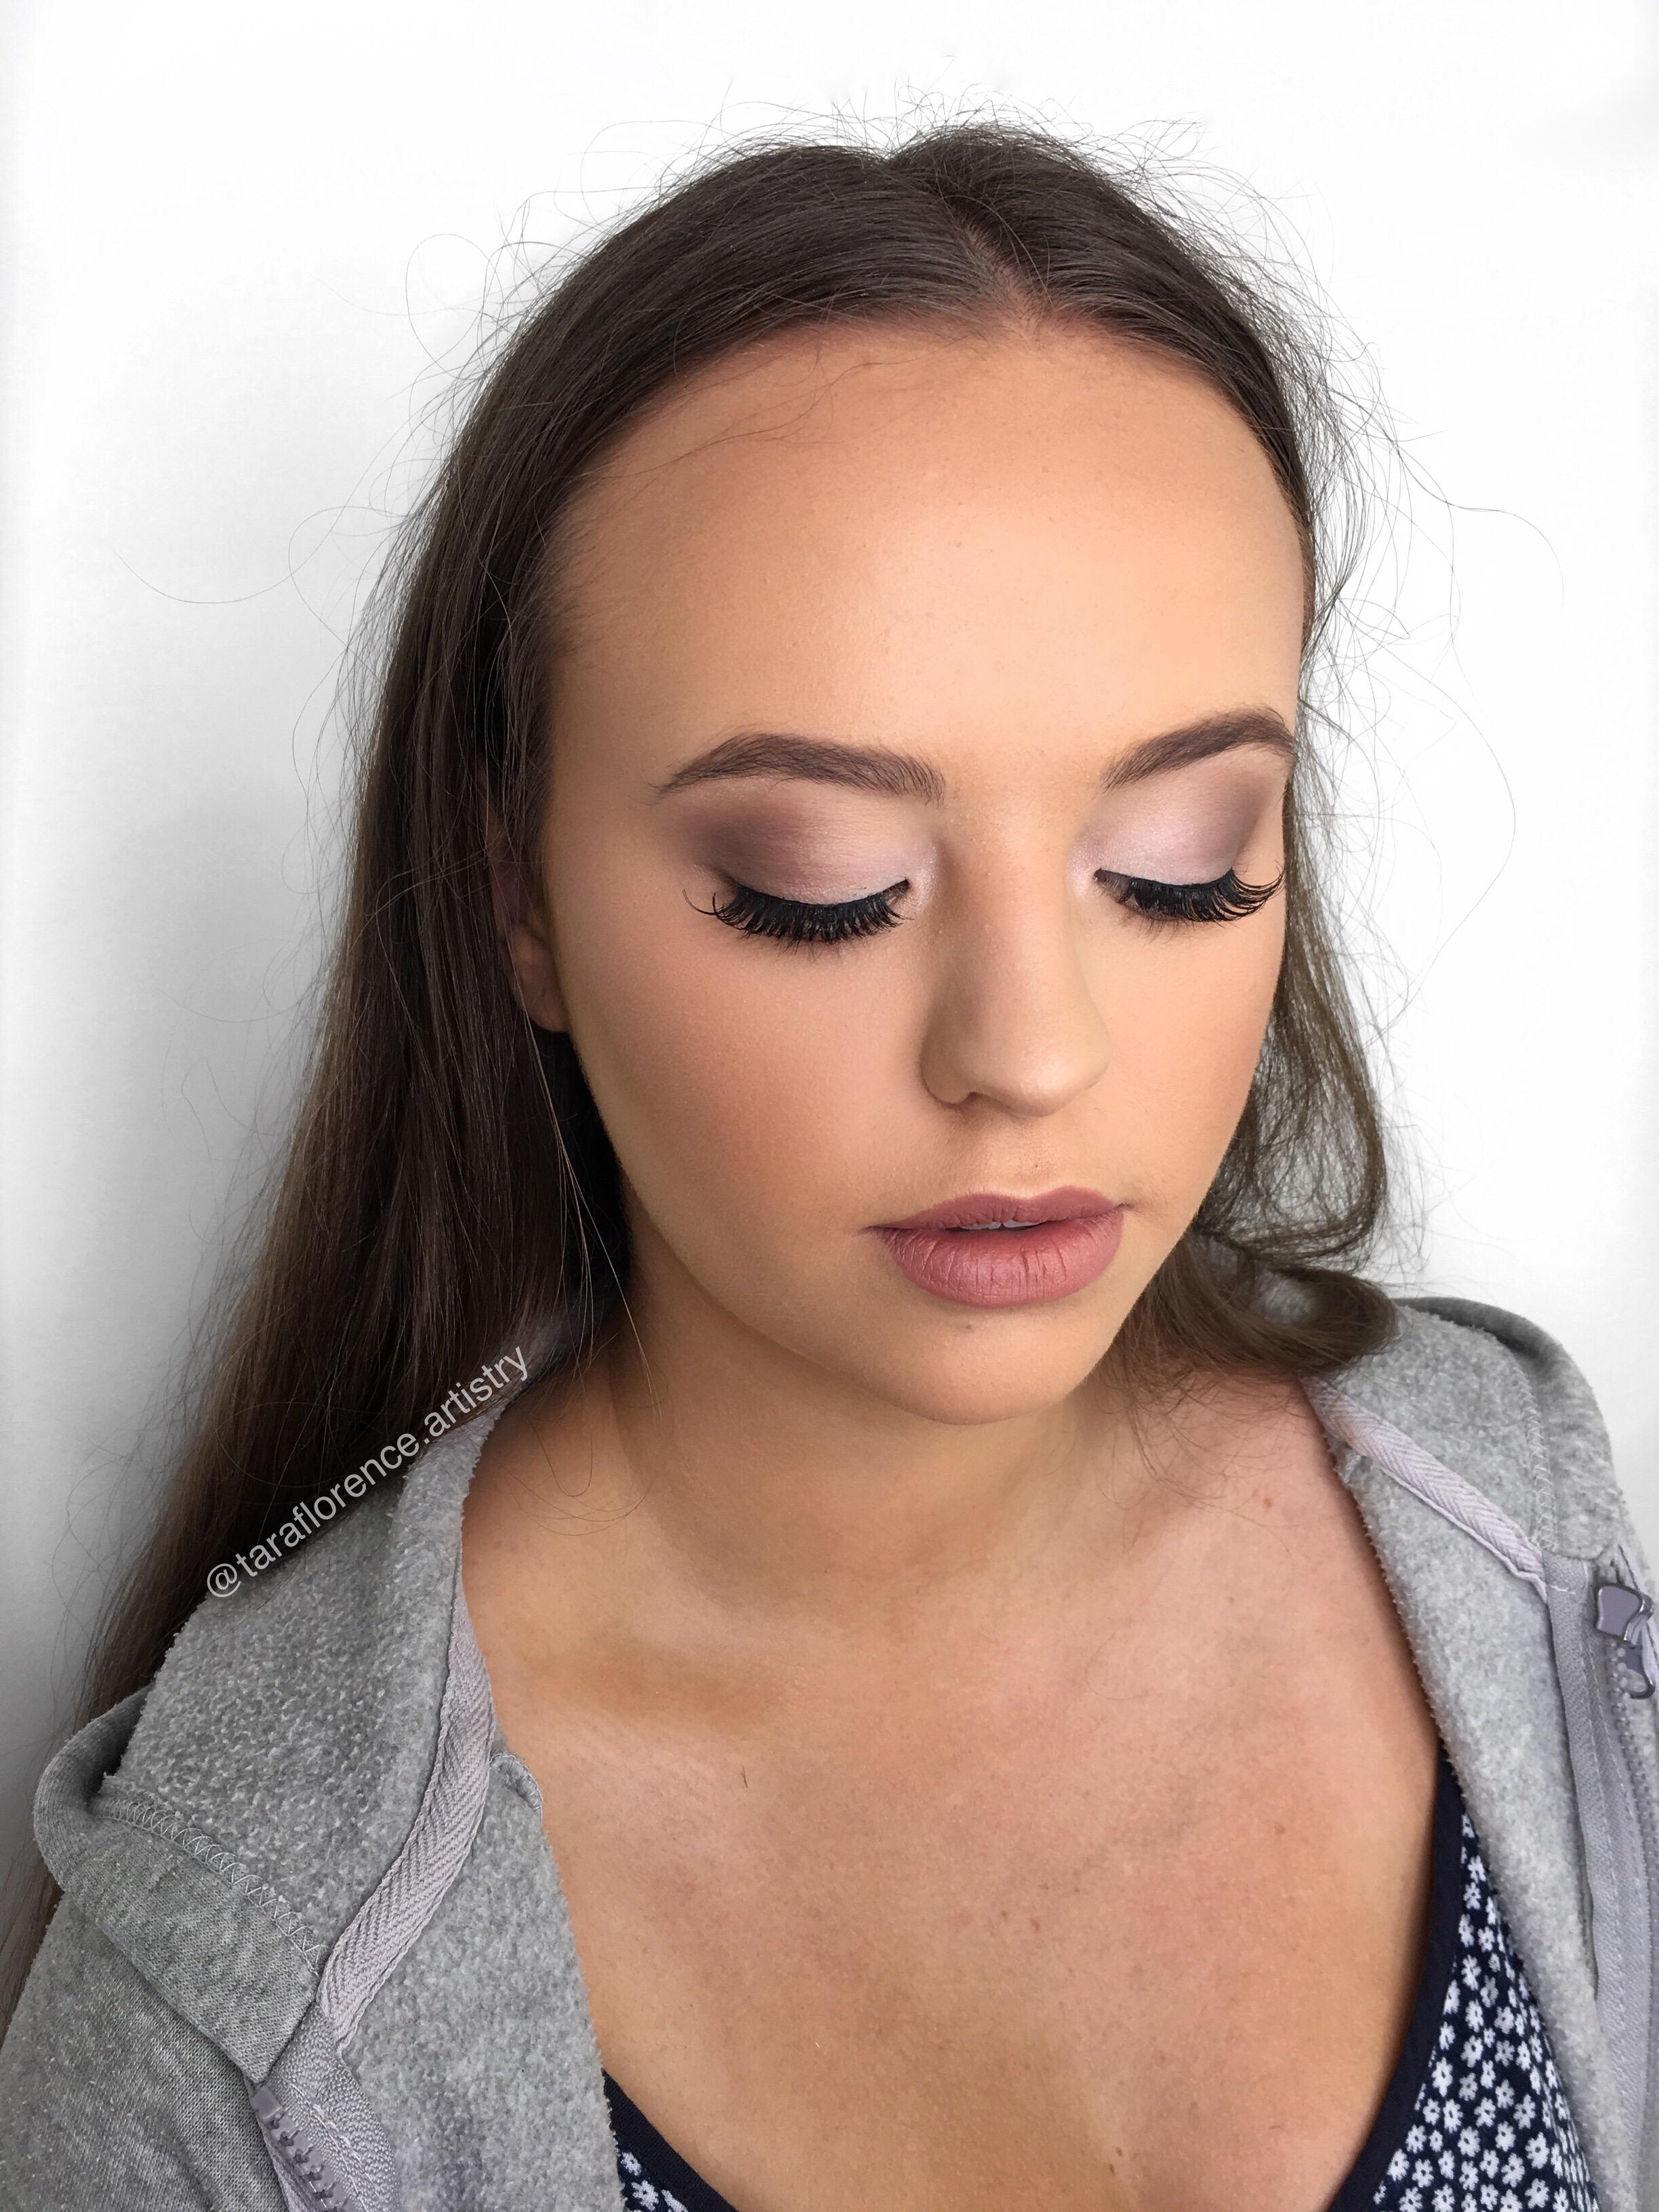 Canberra makeup artist, Canberra Bridal Makeup Artist, Canberra Formal Makeup Artist, Canberra Special Event Makeup Artist, Canberra, Makeup Artist, Mac, Formal, Bridal, Smokey Eye, Makeup,